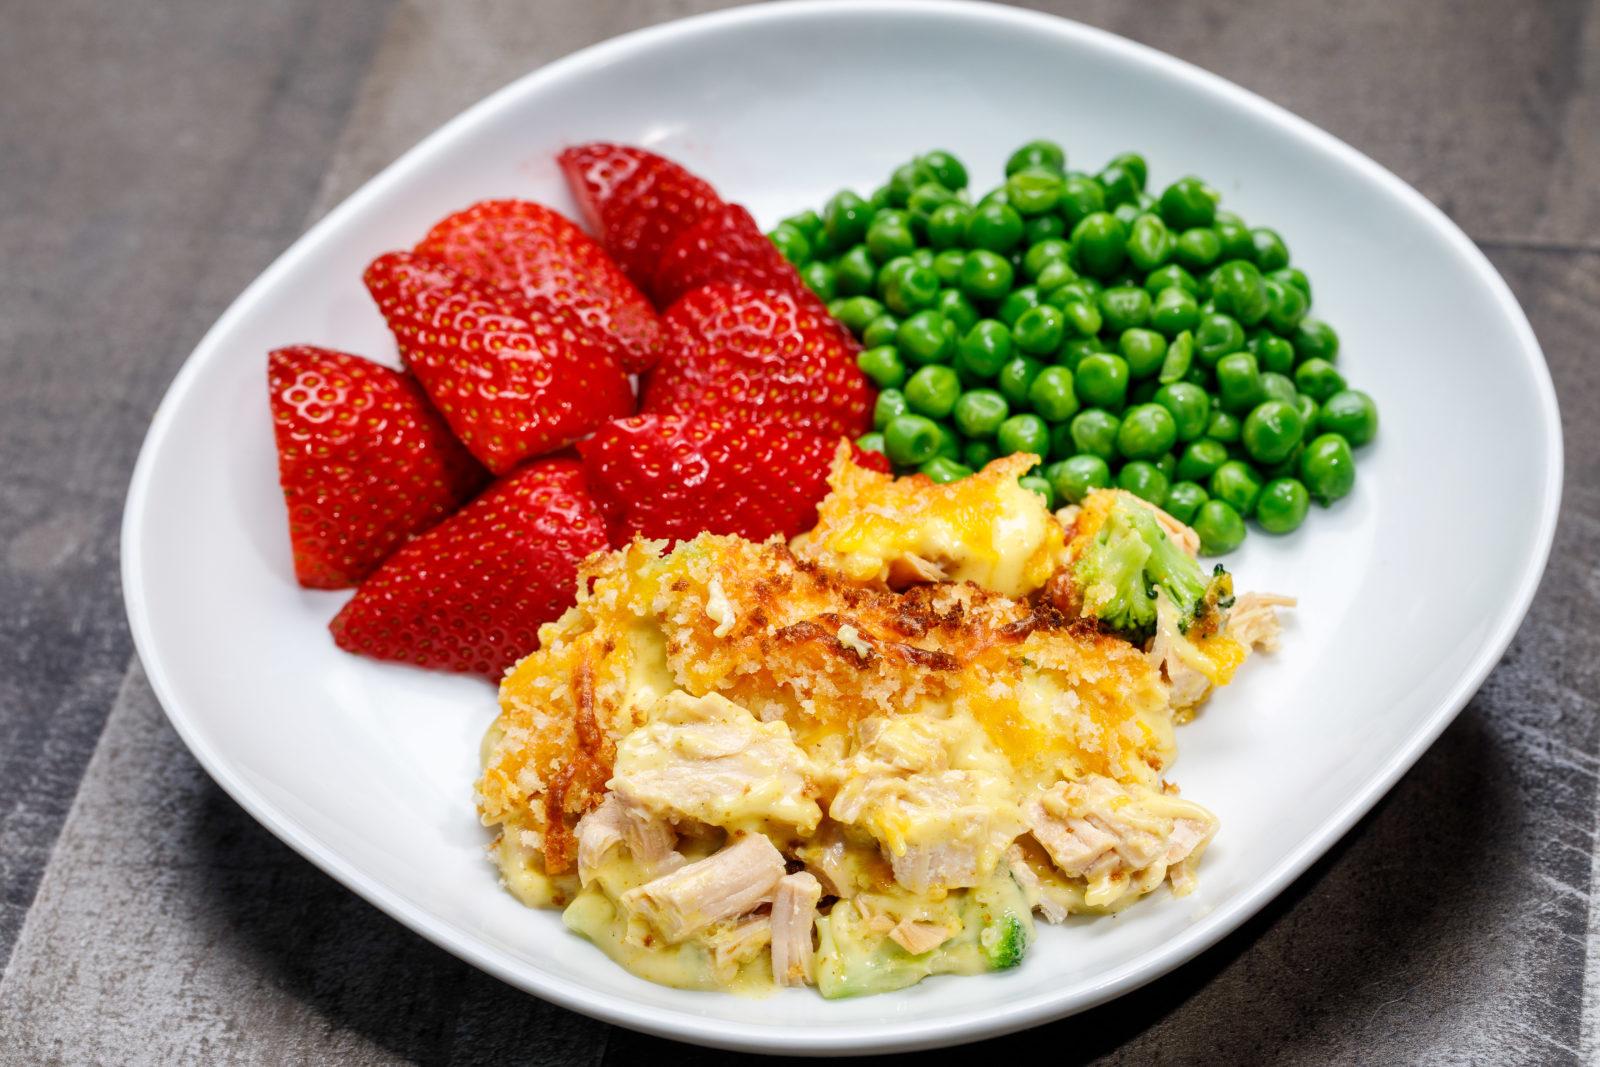 Image of Wild Turkey & Broccoli Casserole